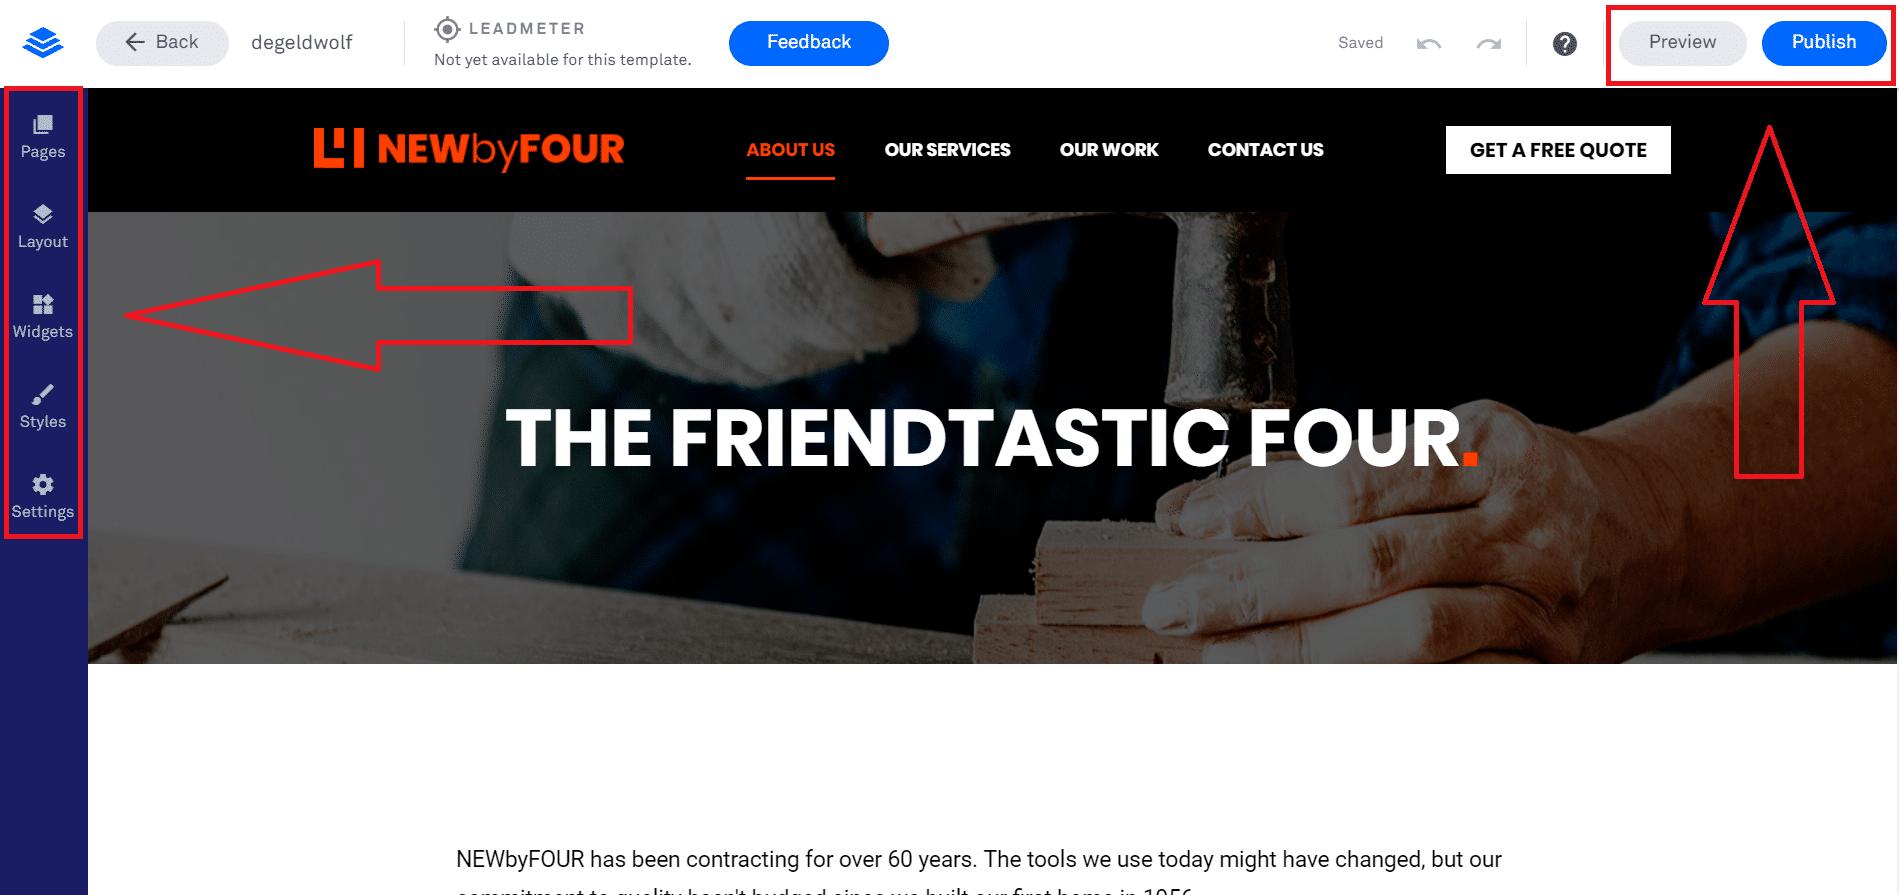 leadpages website maken 2